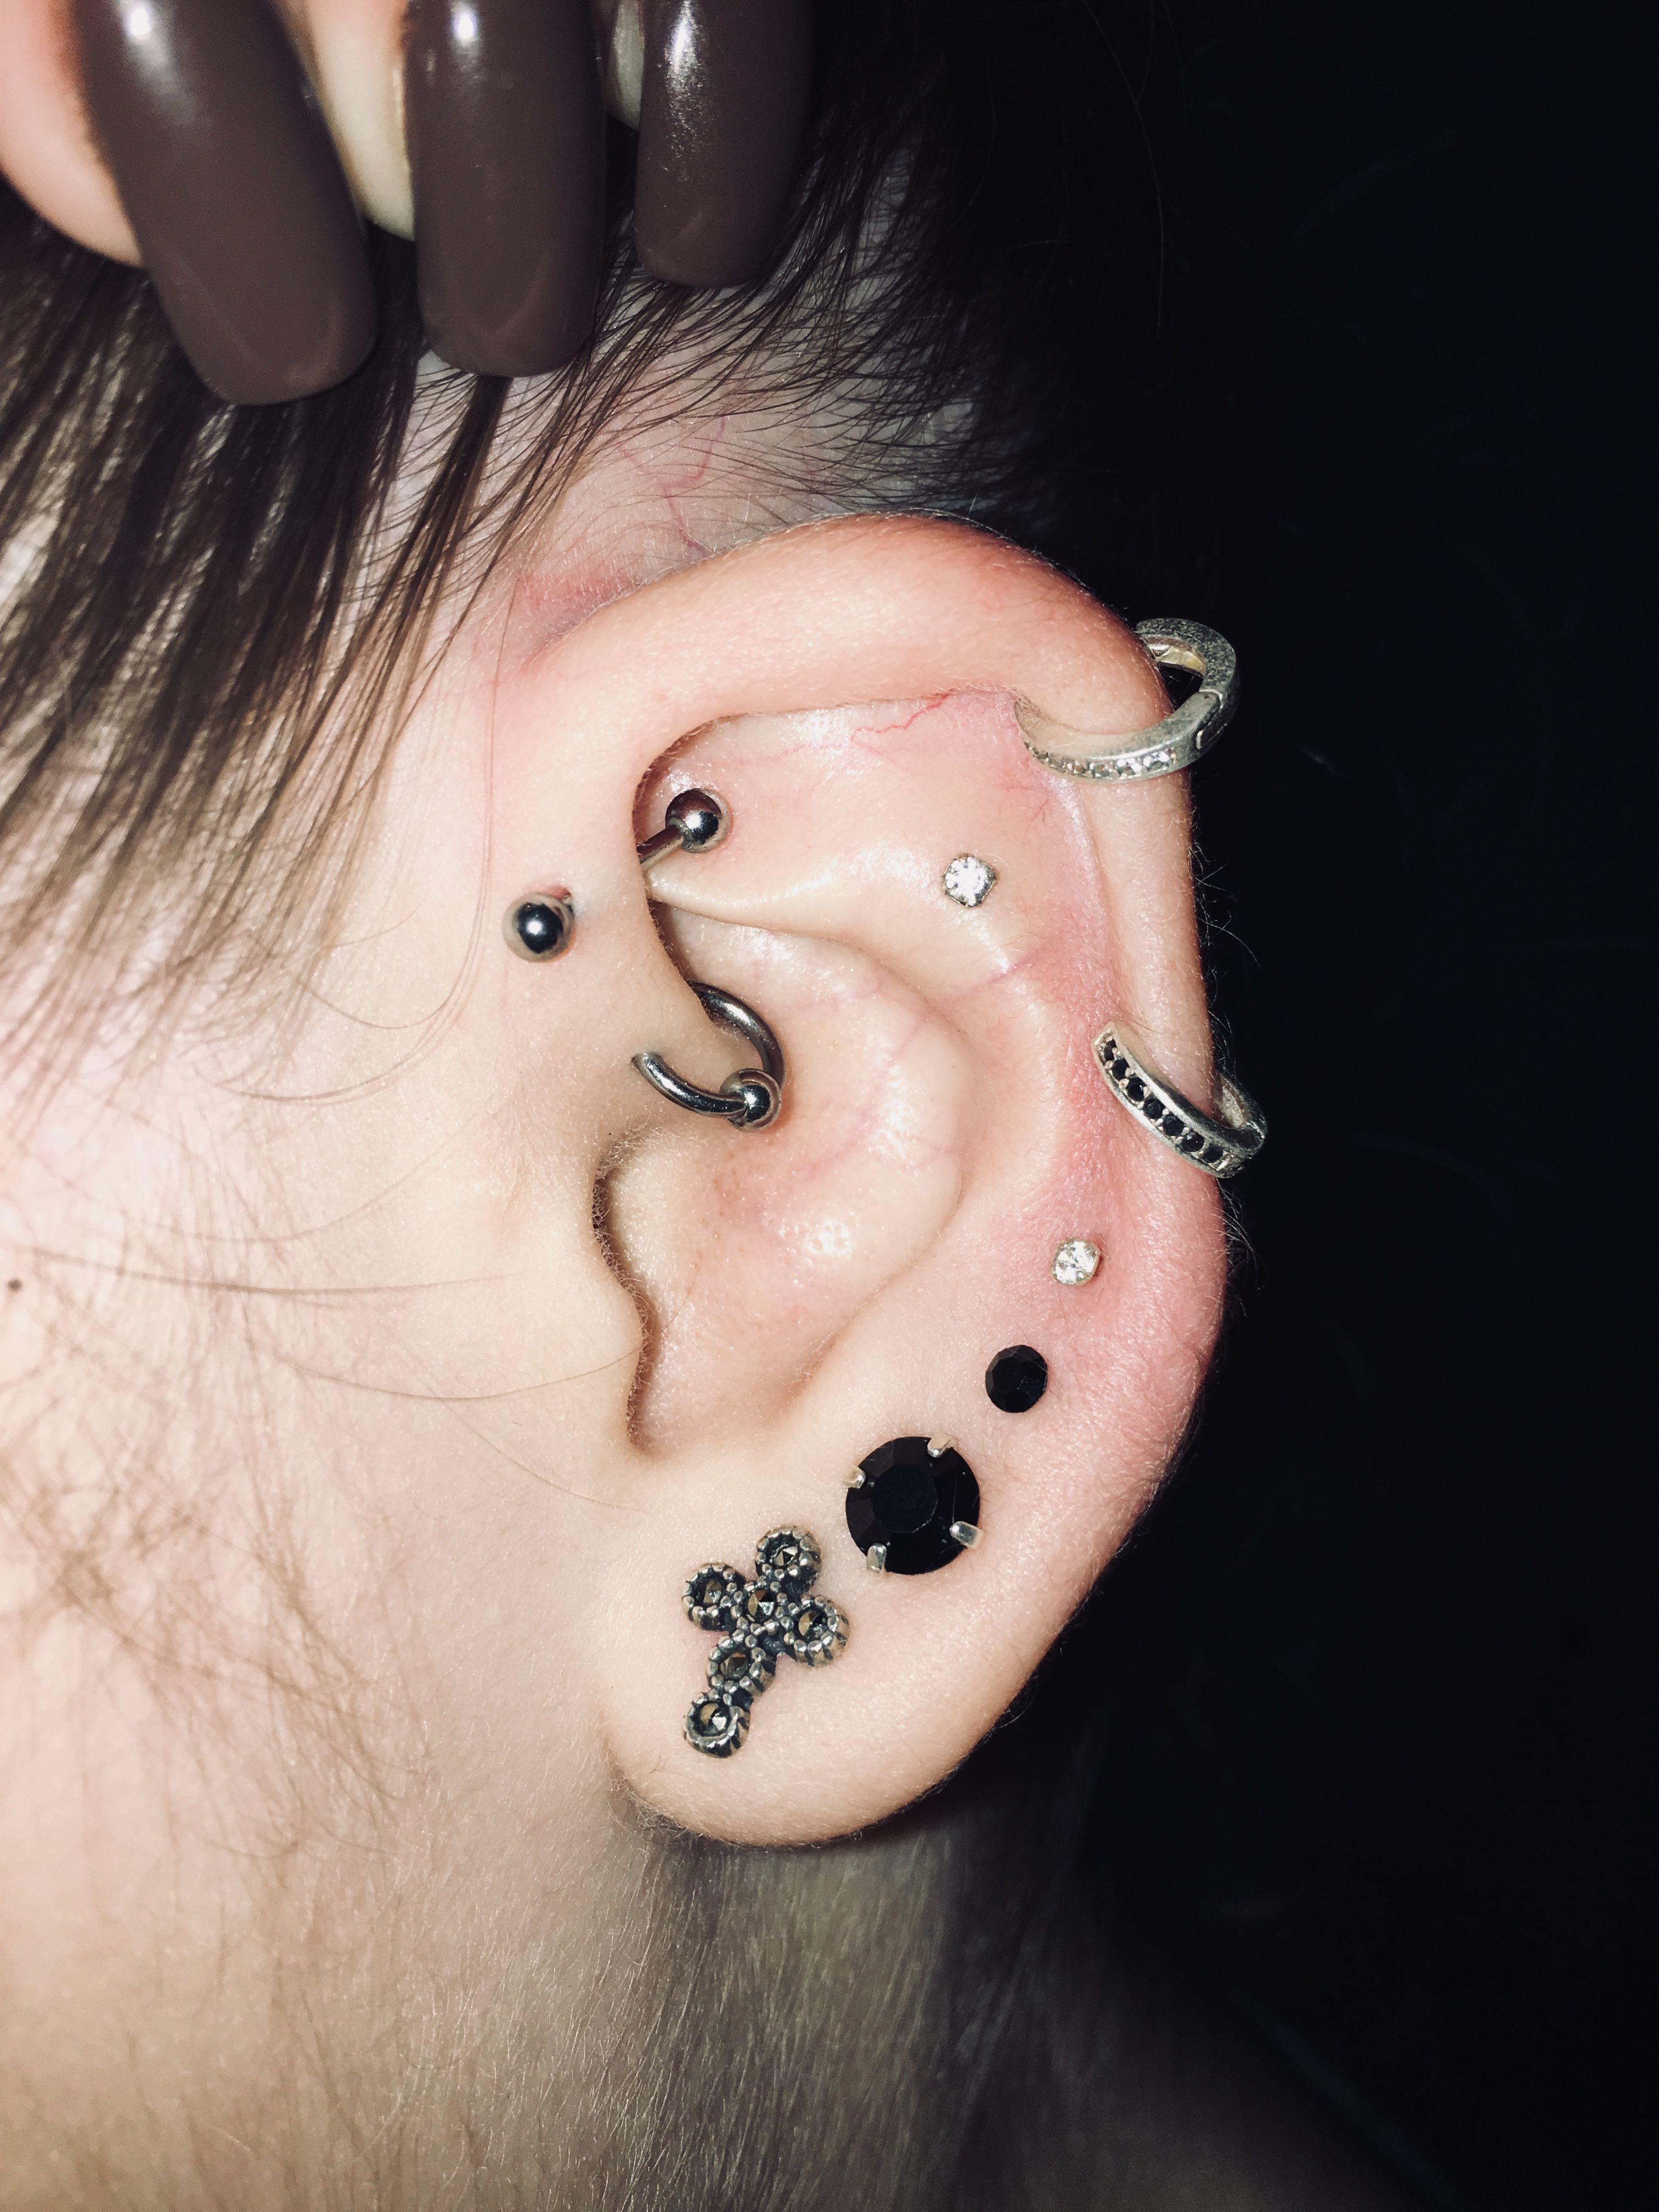 Pin by nikki on Cute ear piercings  Pinterest  Piercings Piercing